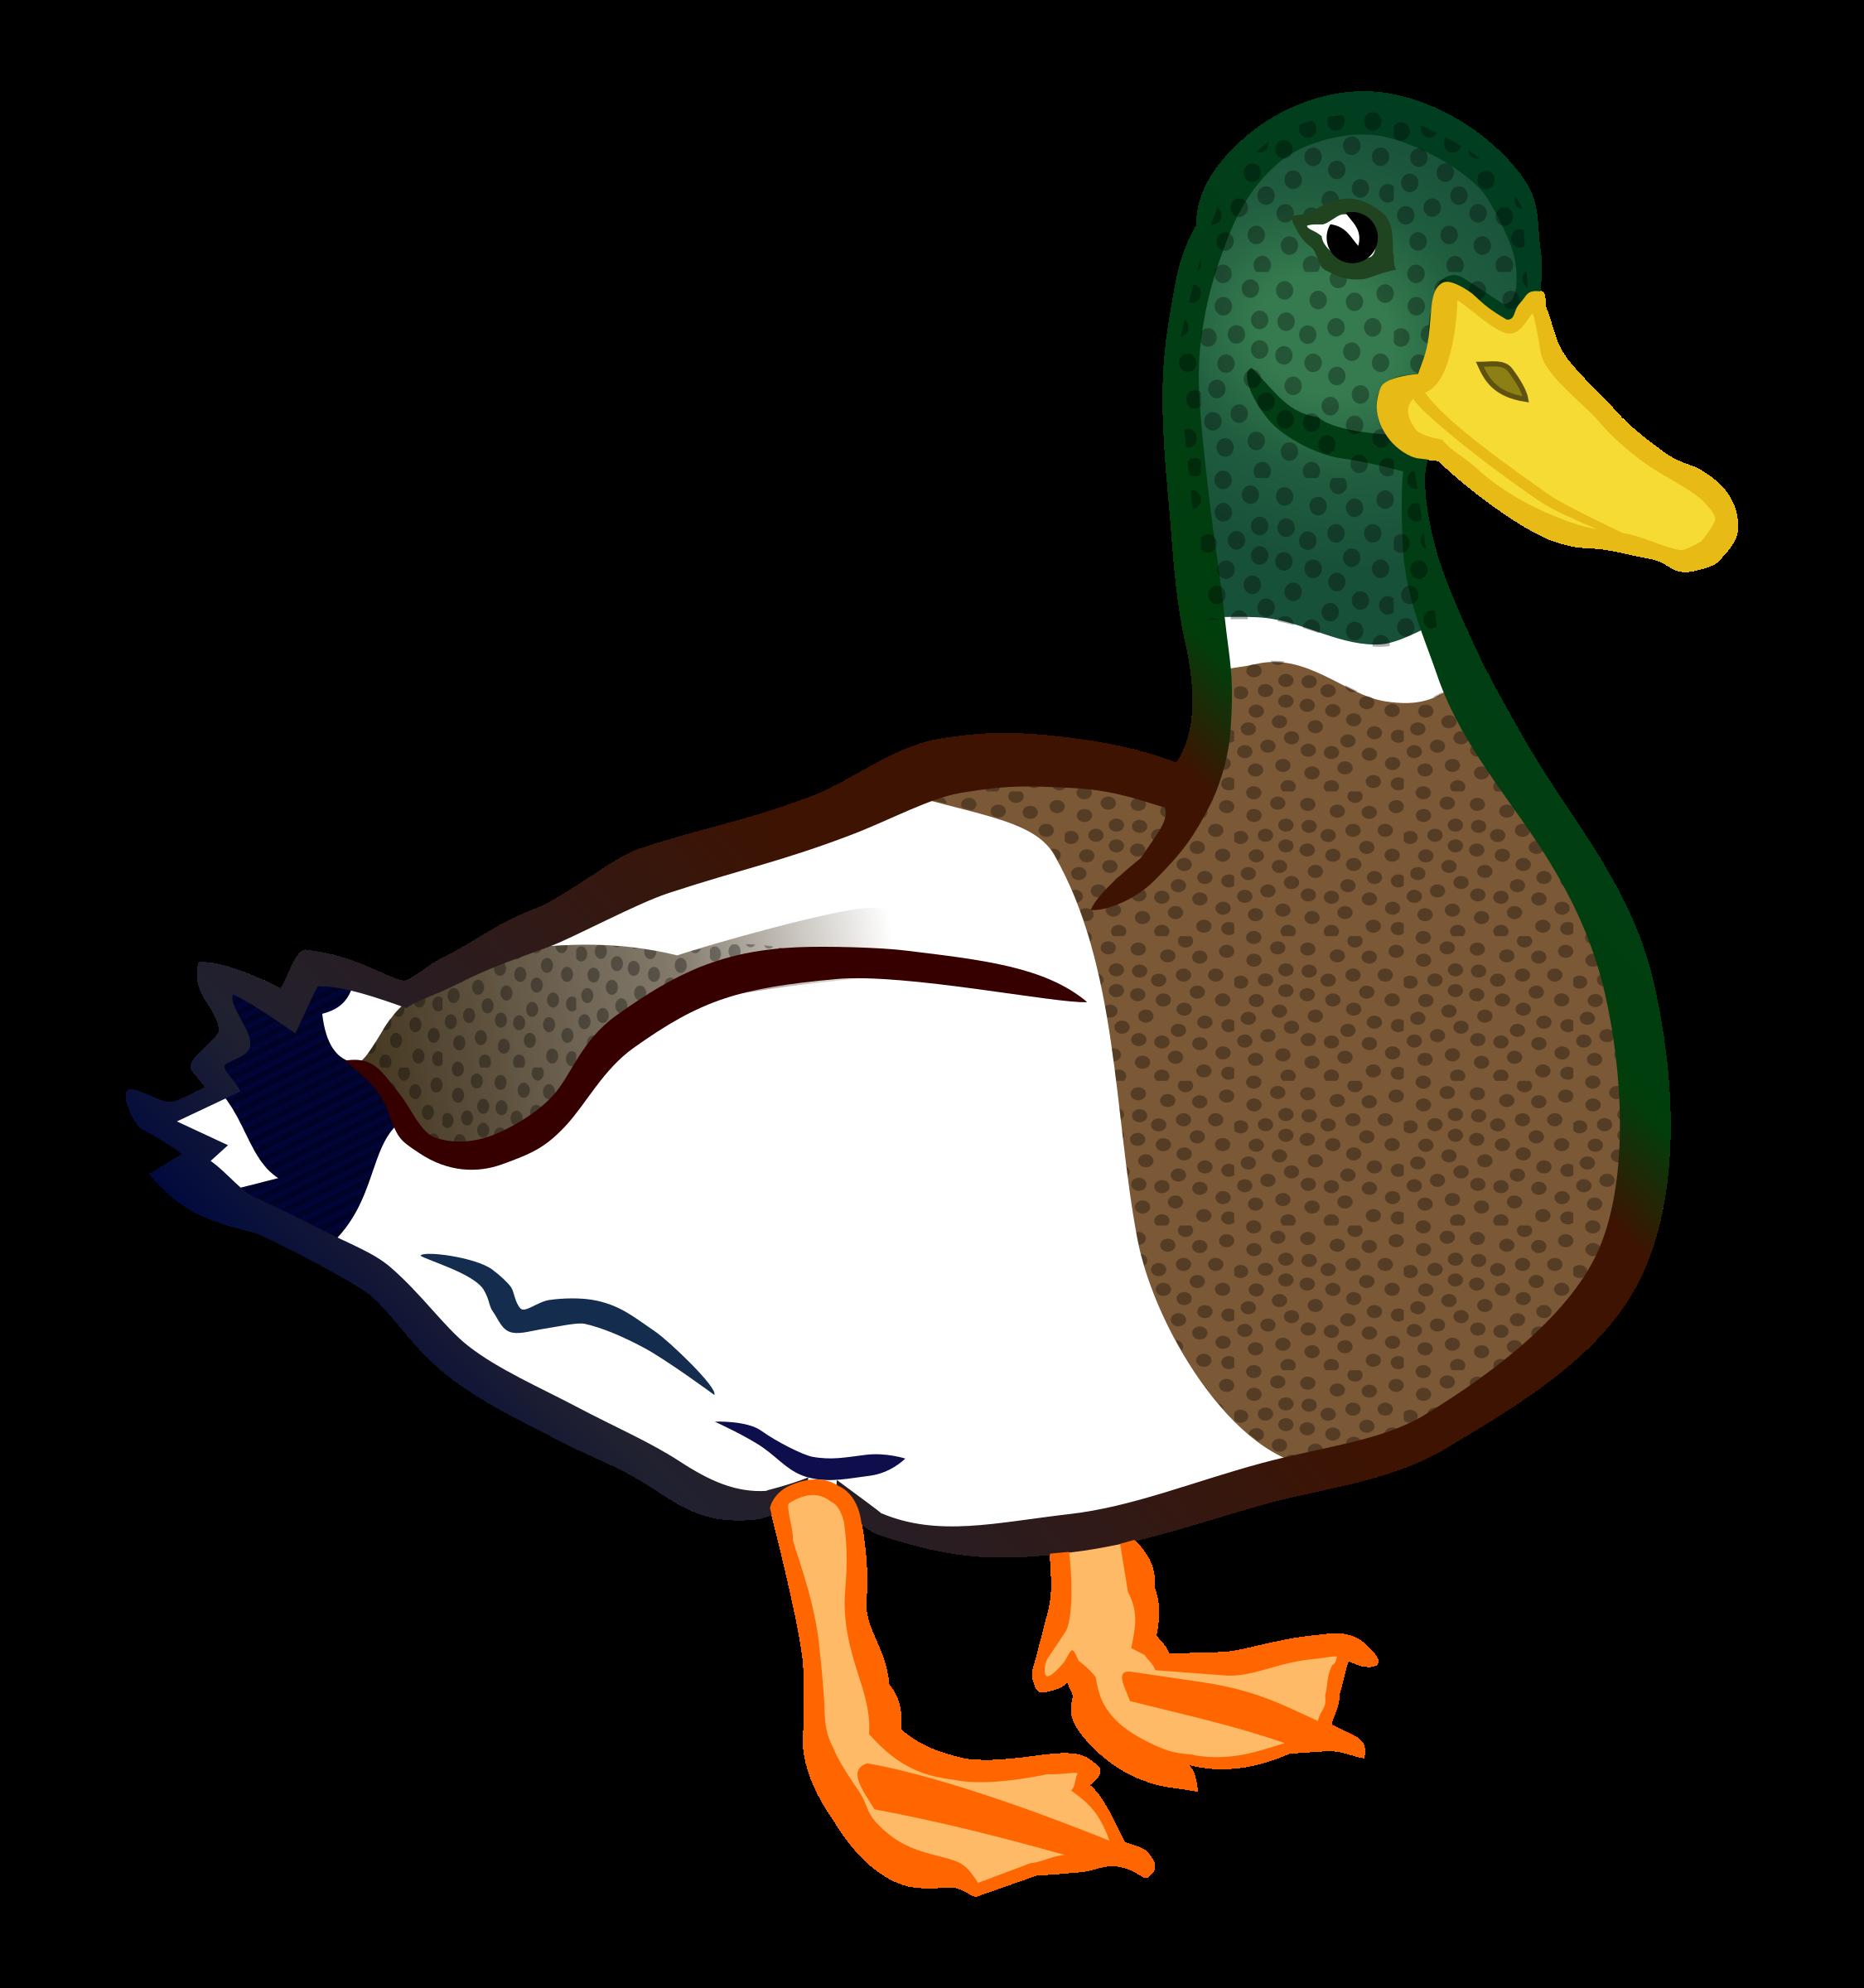 Duck coloured big image. Ducks clipart dack